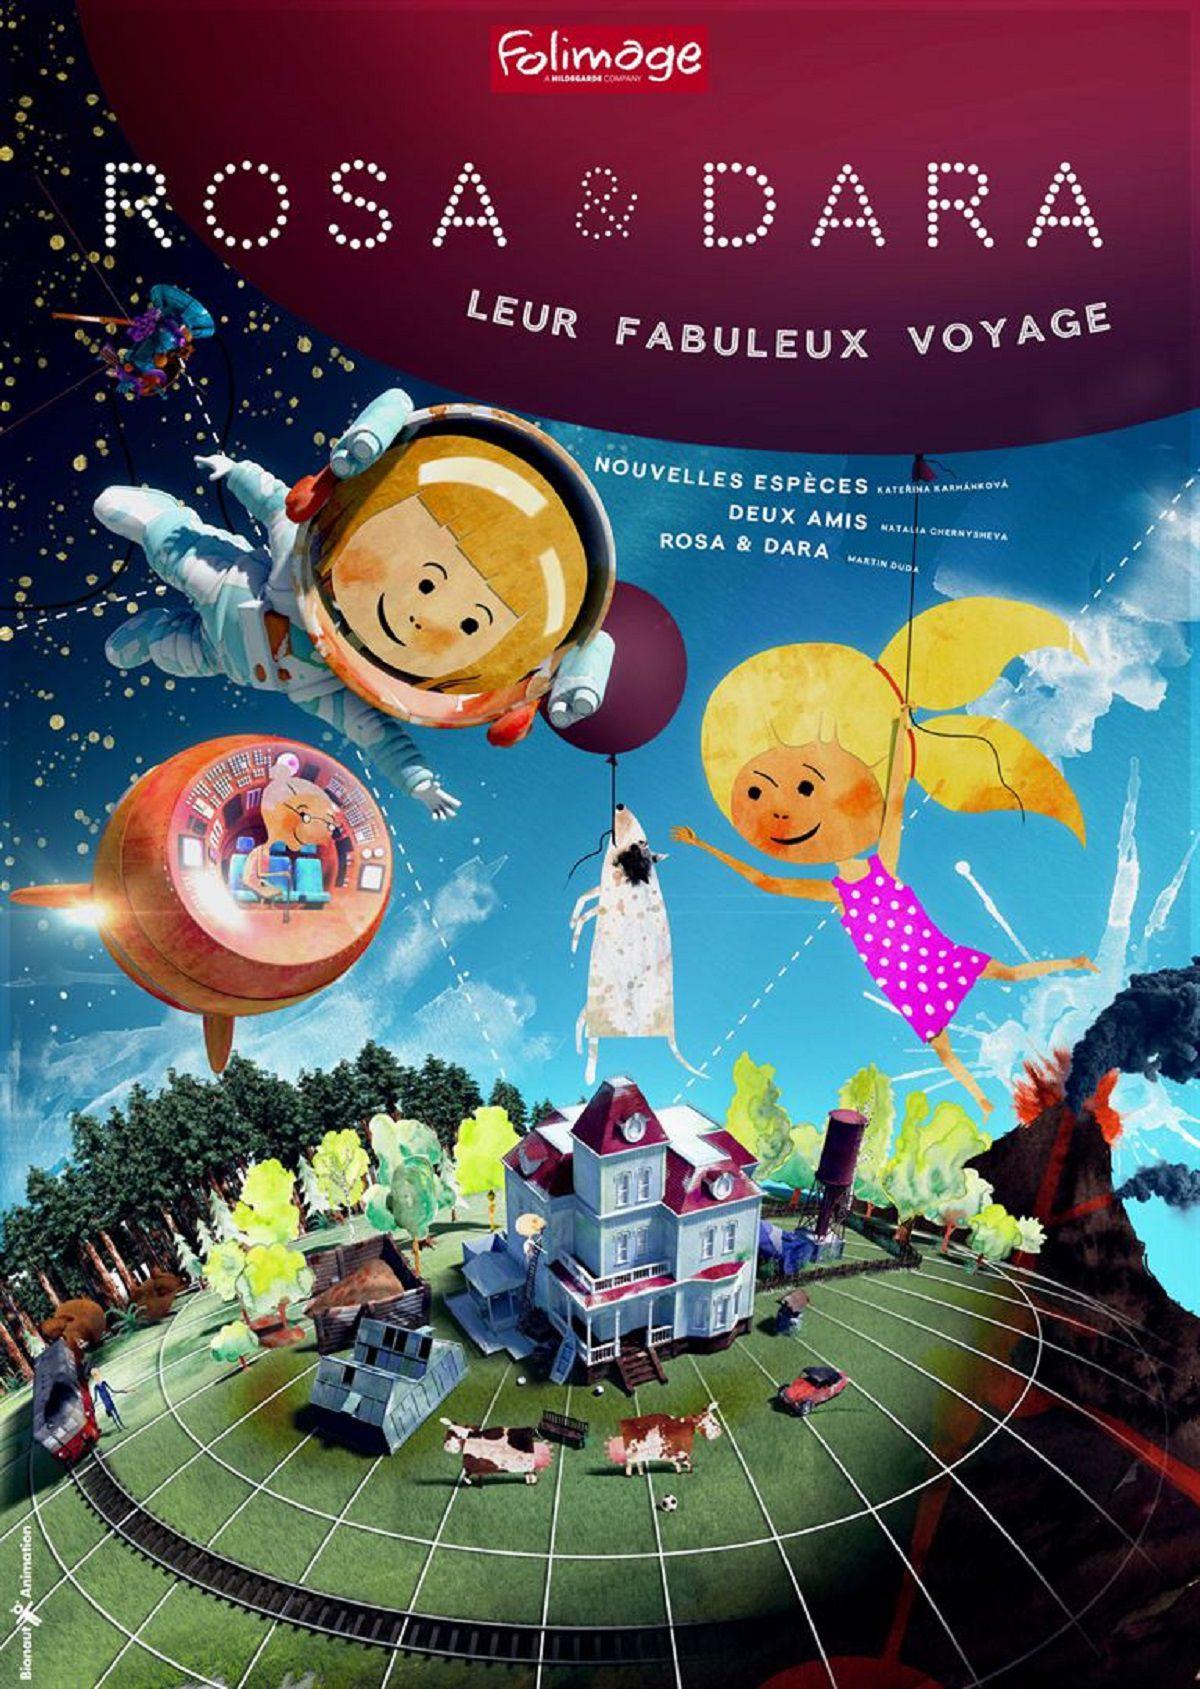 Rosa & Dara: leur fabuleux voyage - Film (2015)